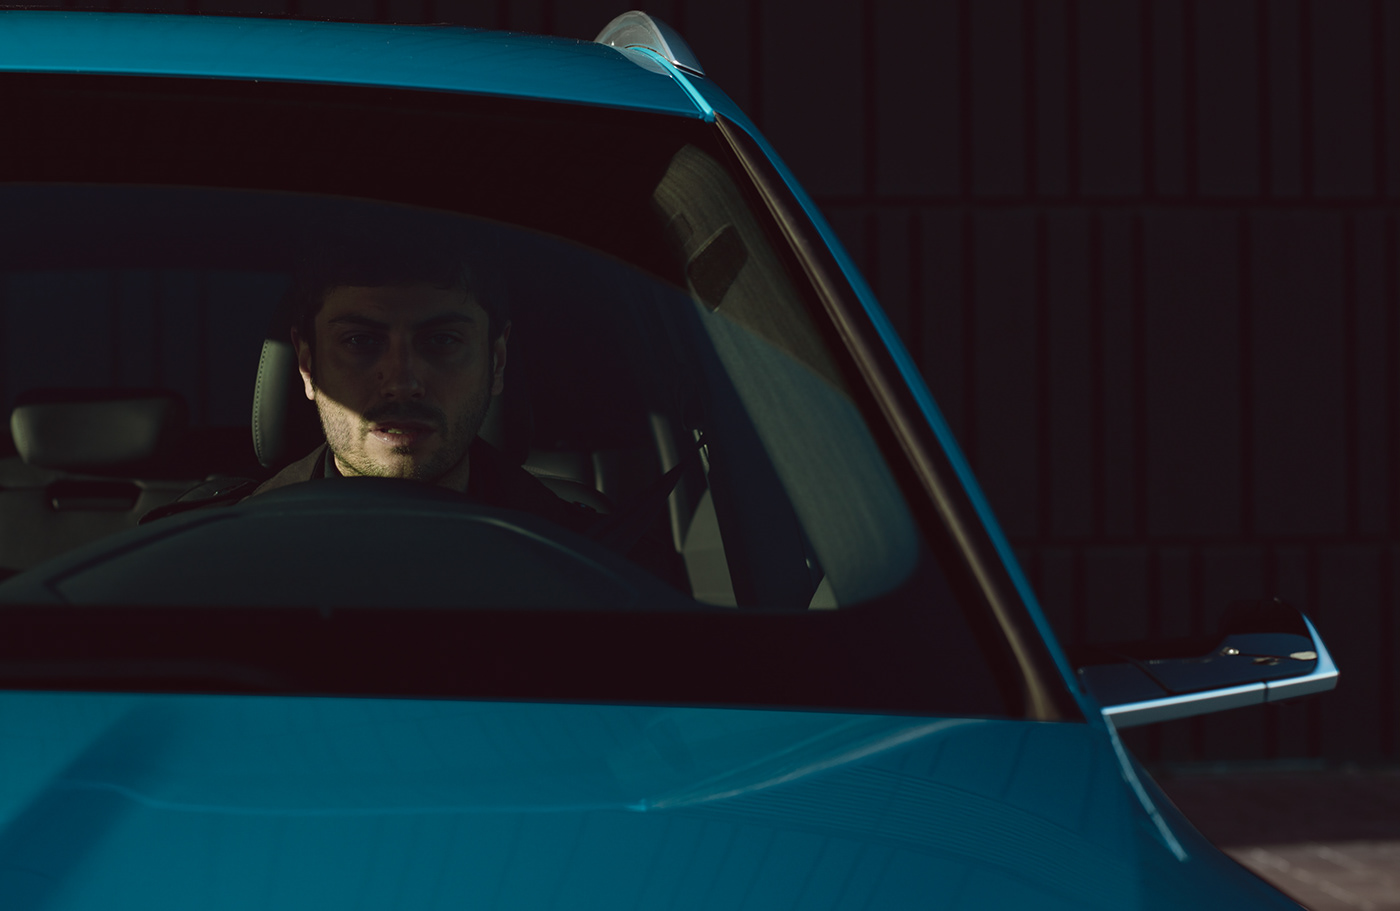 Image may contain: car, vehicle and human face